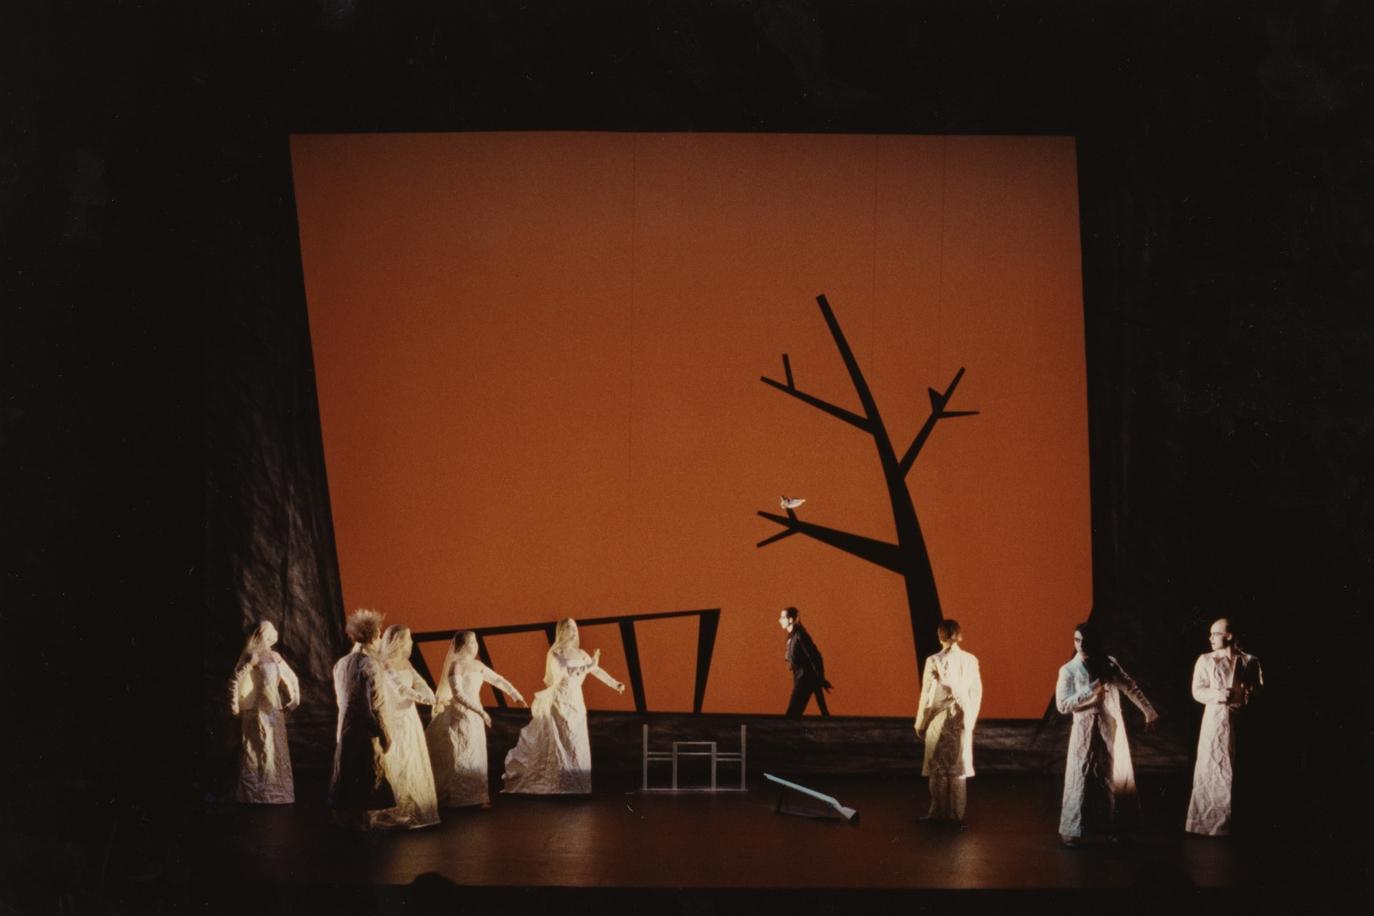 Berliner Festspiele, 1990